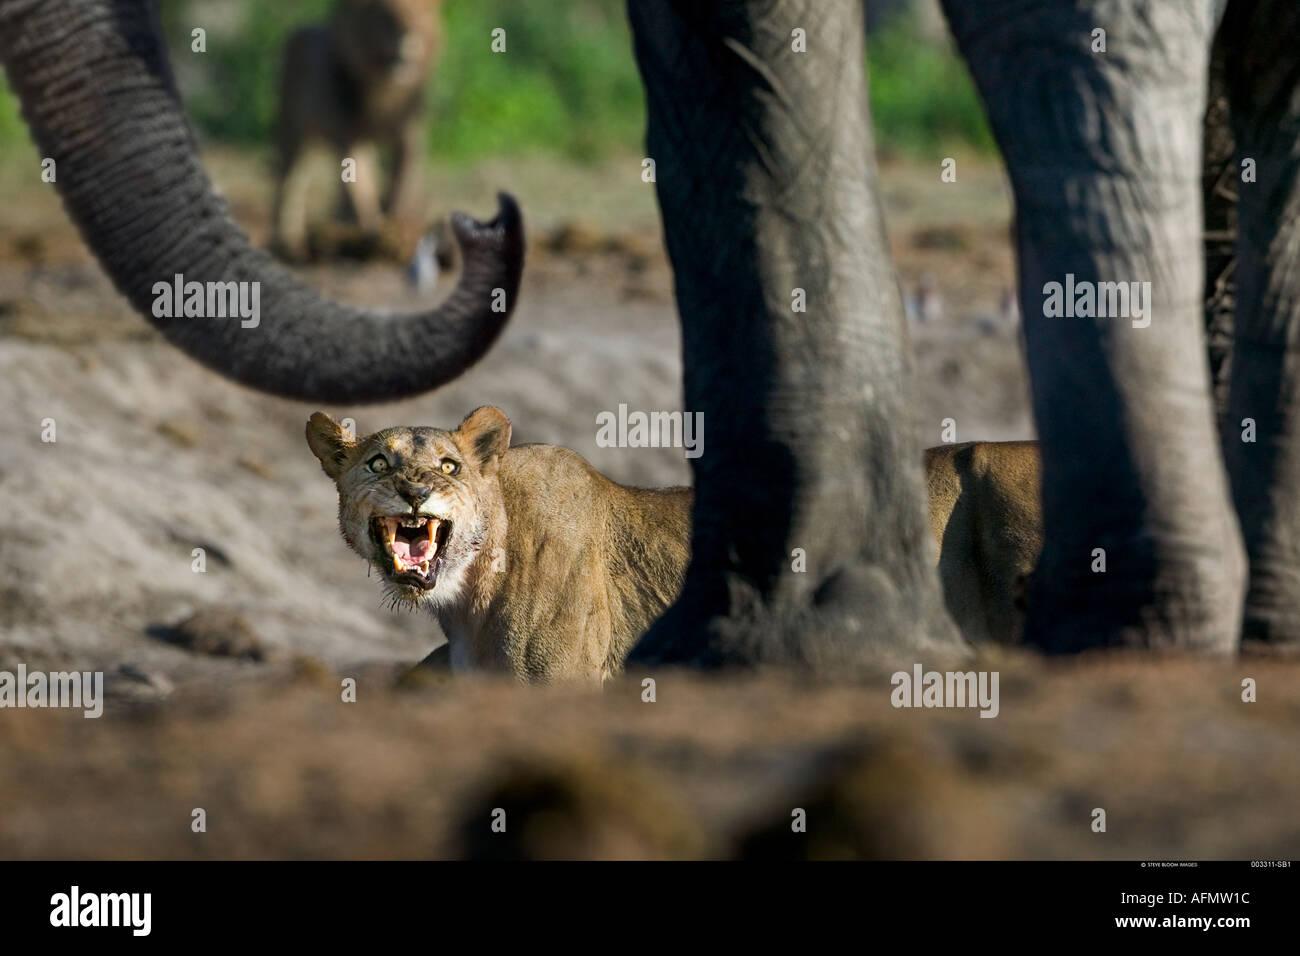 Confrontation between lioness and elephant at waterhole Savuti Botswana - Stock Image